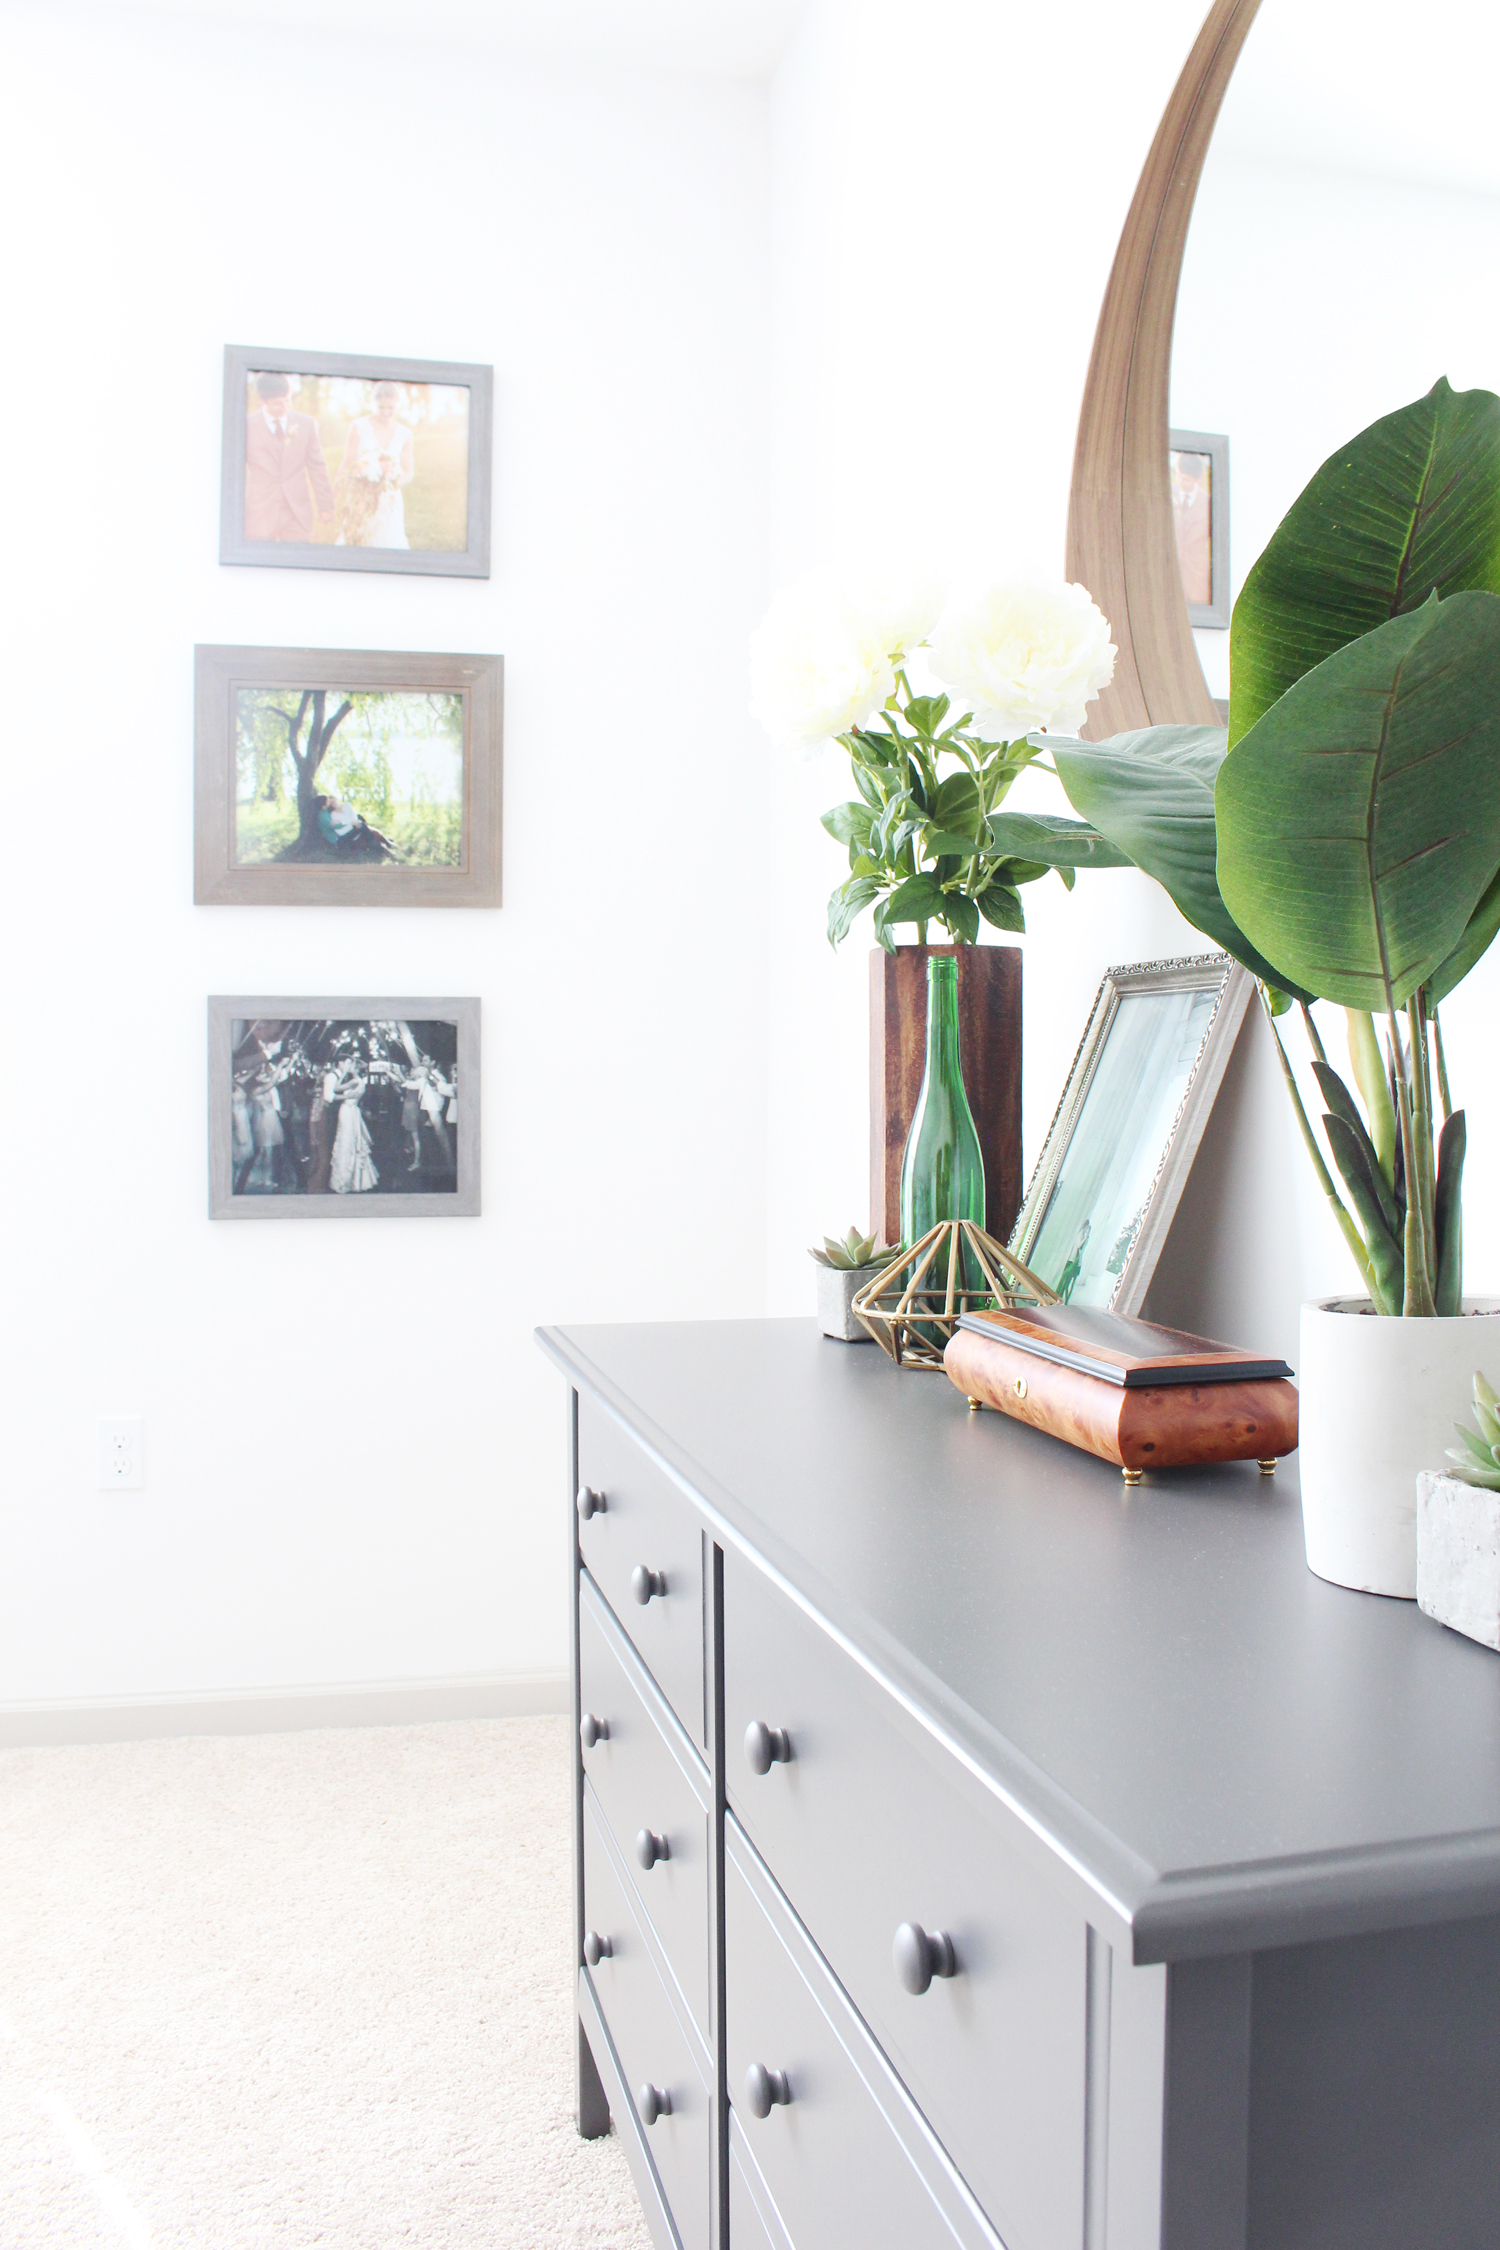 Modern-Farmhouse-Bedroom-Blue-Green-White-Mix-&-Match-Design-12.jpg